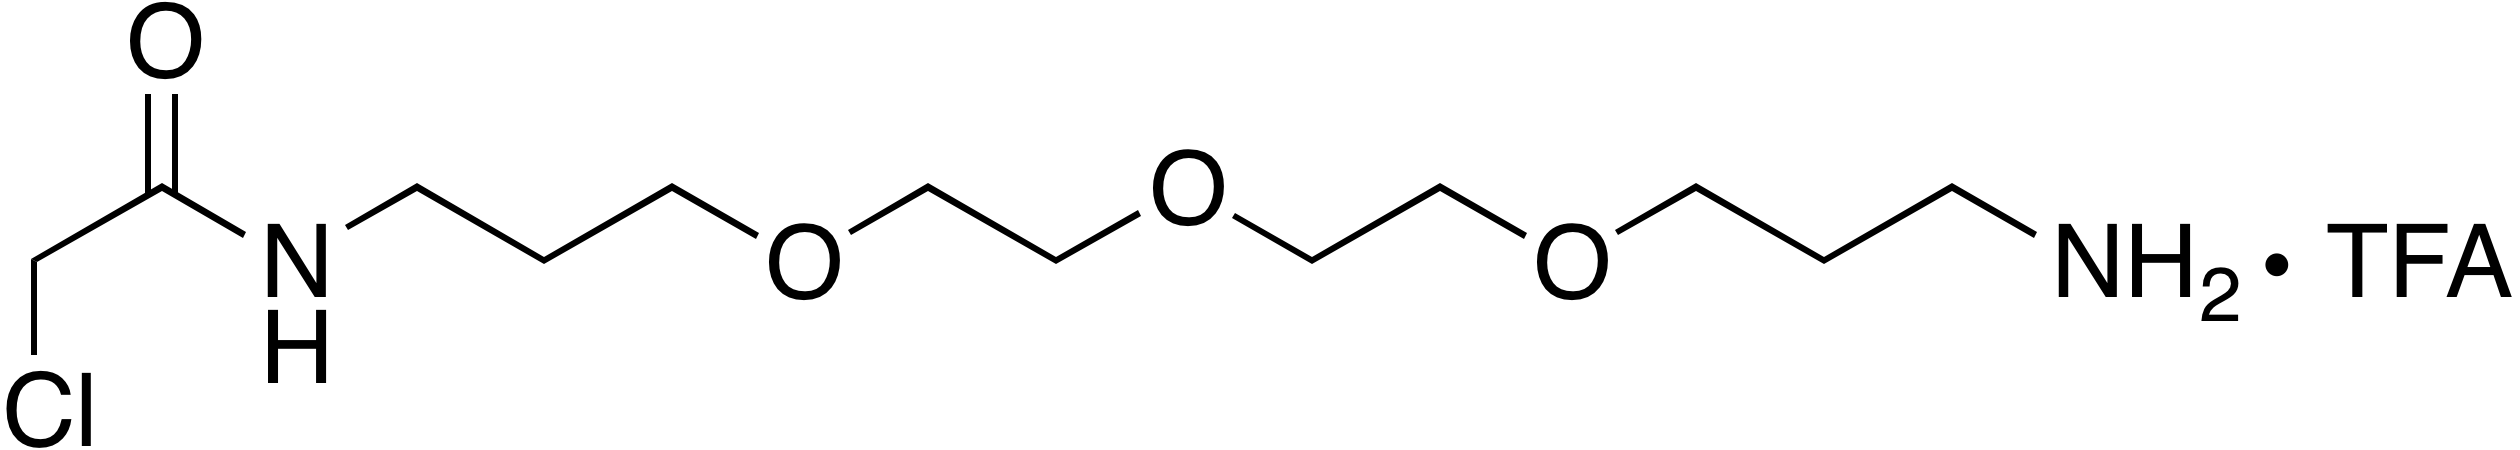 N-(3-(2-(2-(3-Aminopropoxy)ethoxy)ethoxy)propyl)-2-chloroacetamide trifluoroacetate